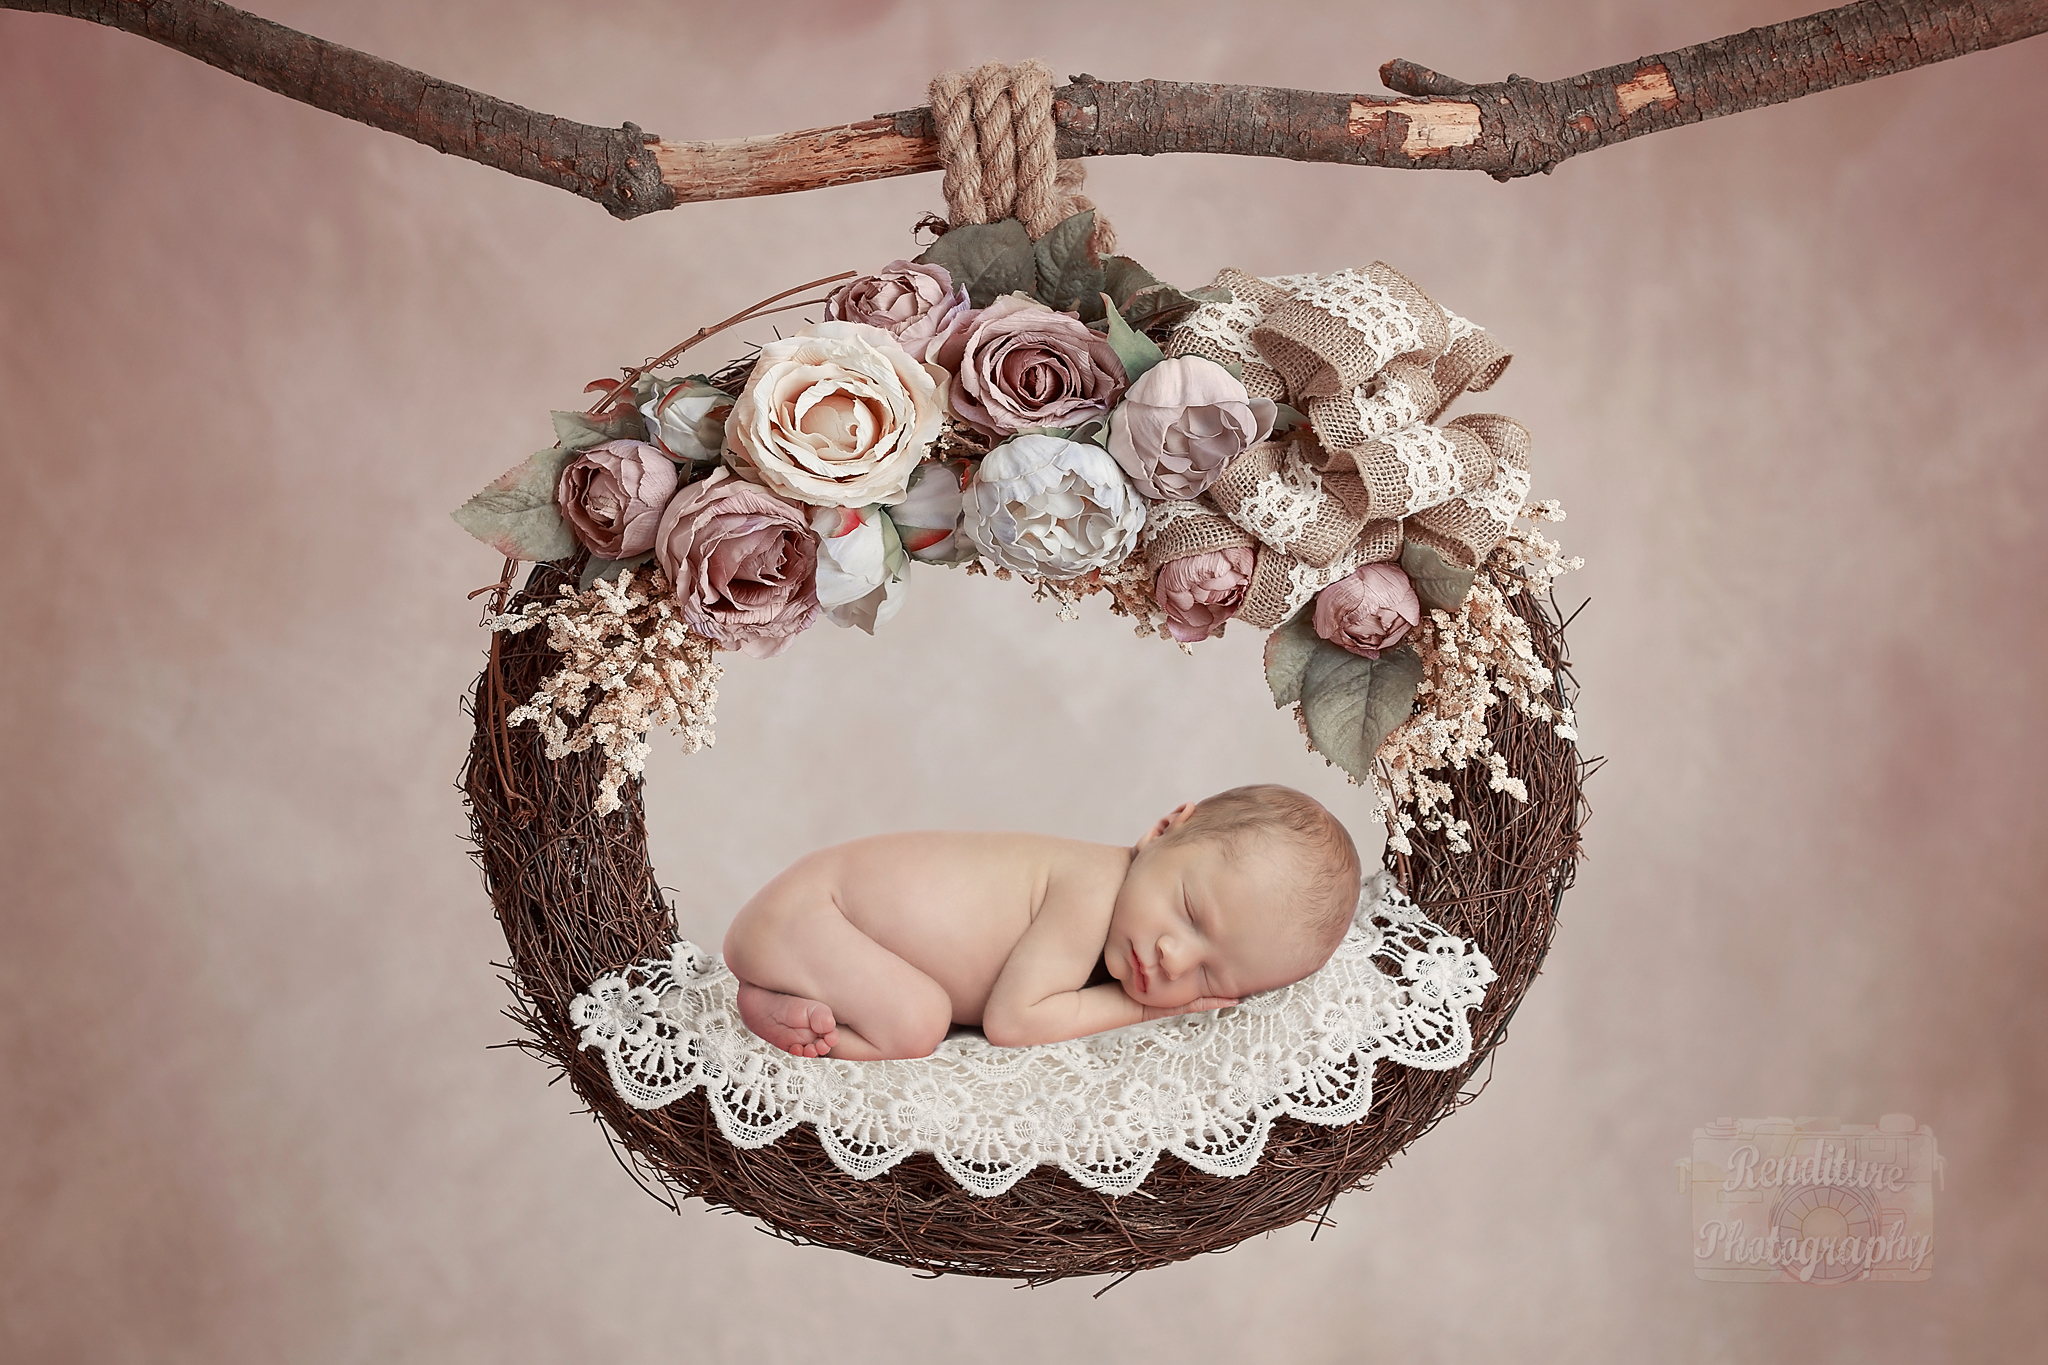 Saskatoon,Maternity,Photographer,Pregnancy,Pregnant,Photographer,Maternity,Pregnancy,Family, Renditure,Photos,Saskatchewan,YXE,SK